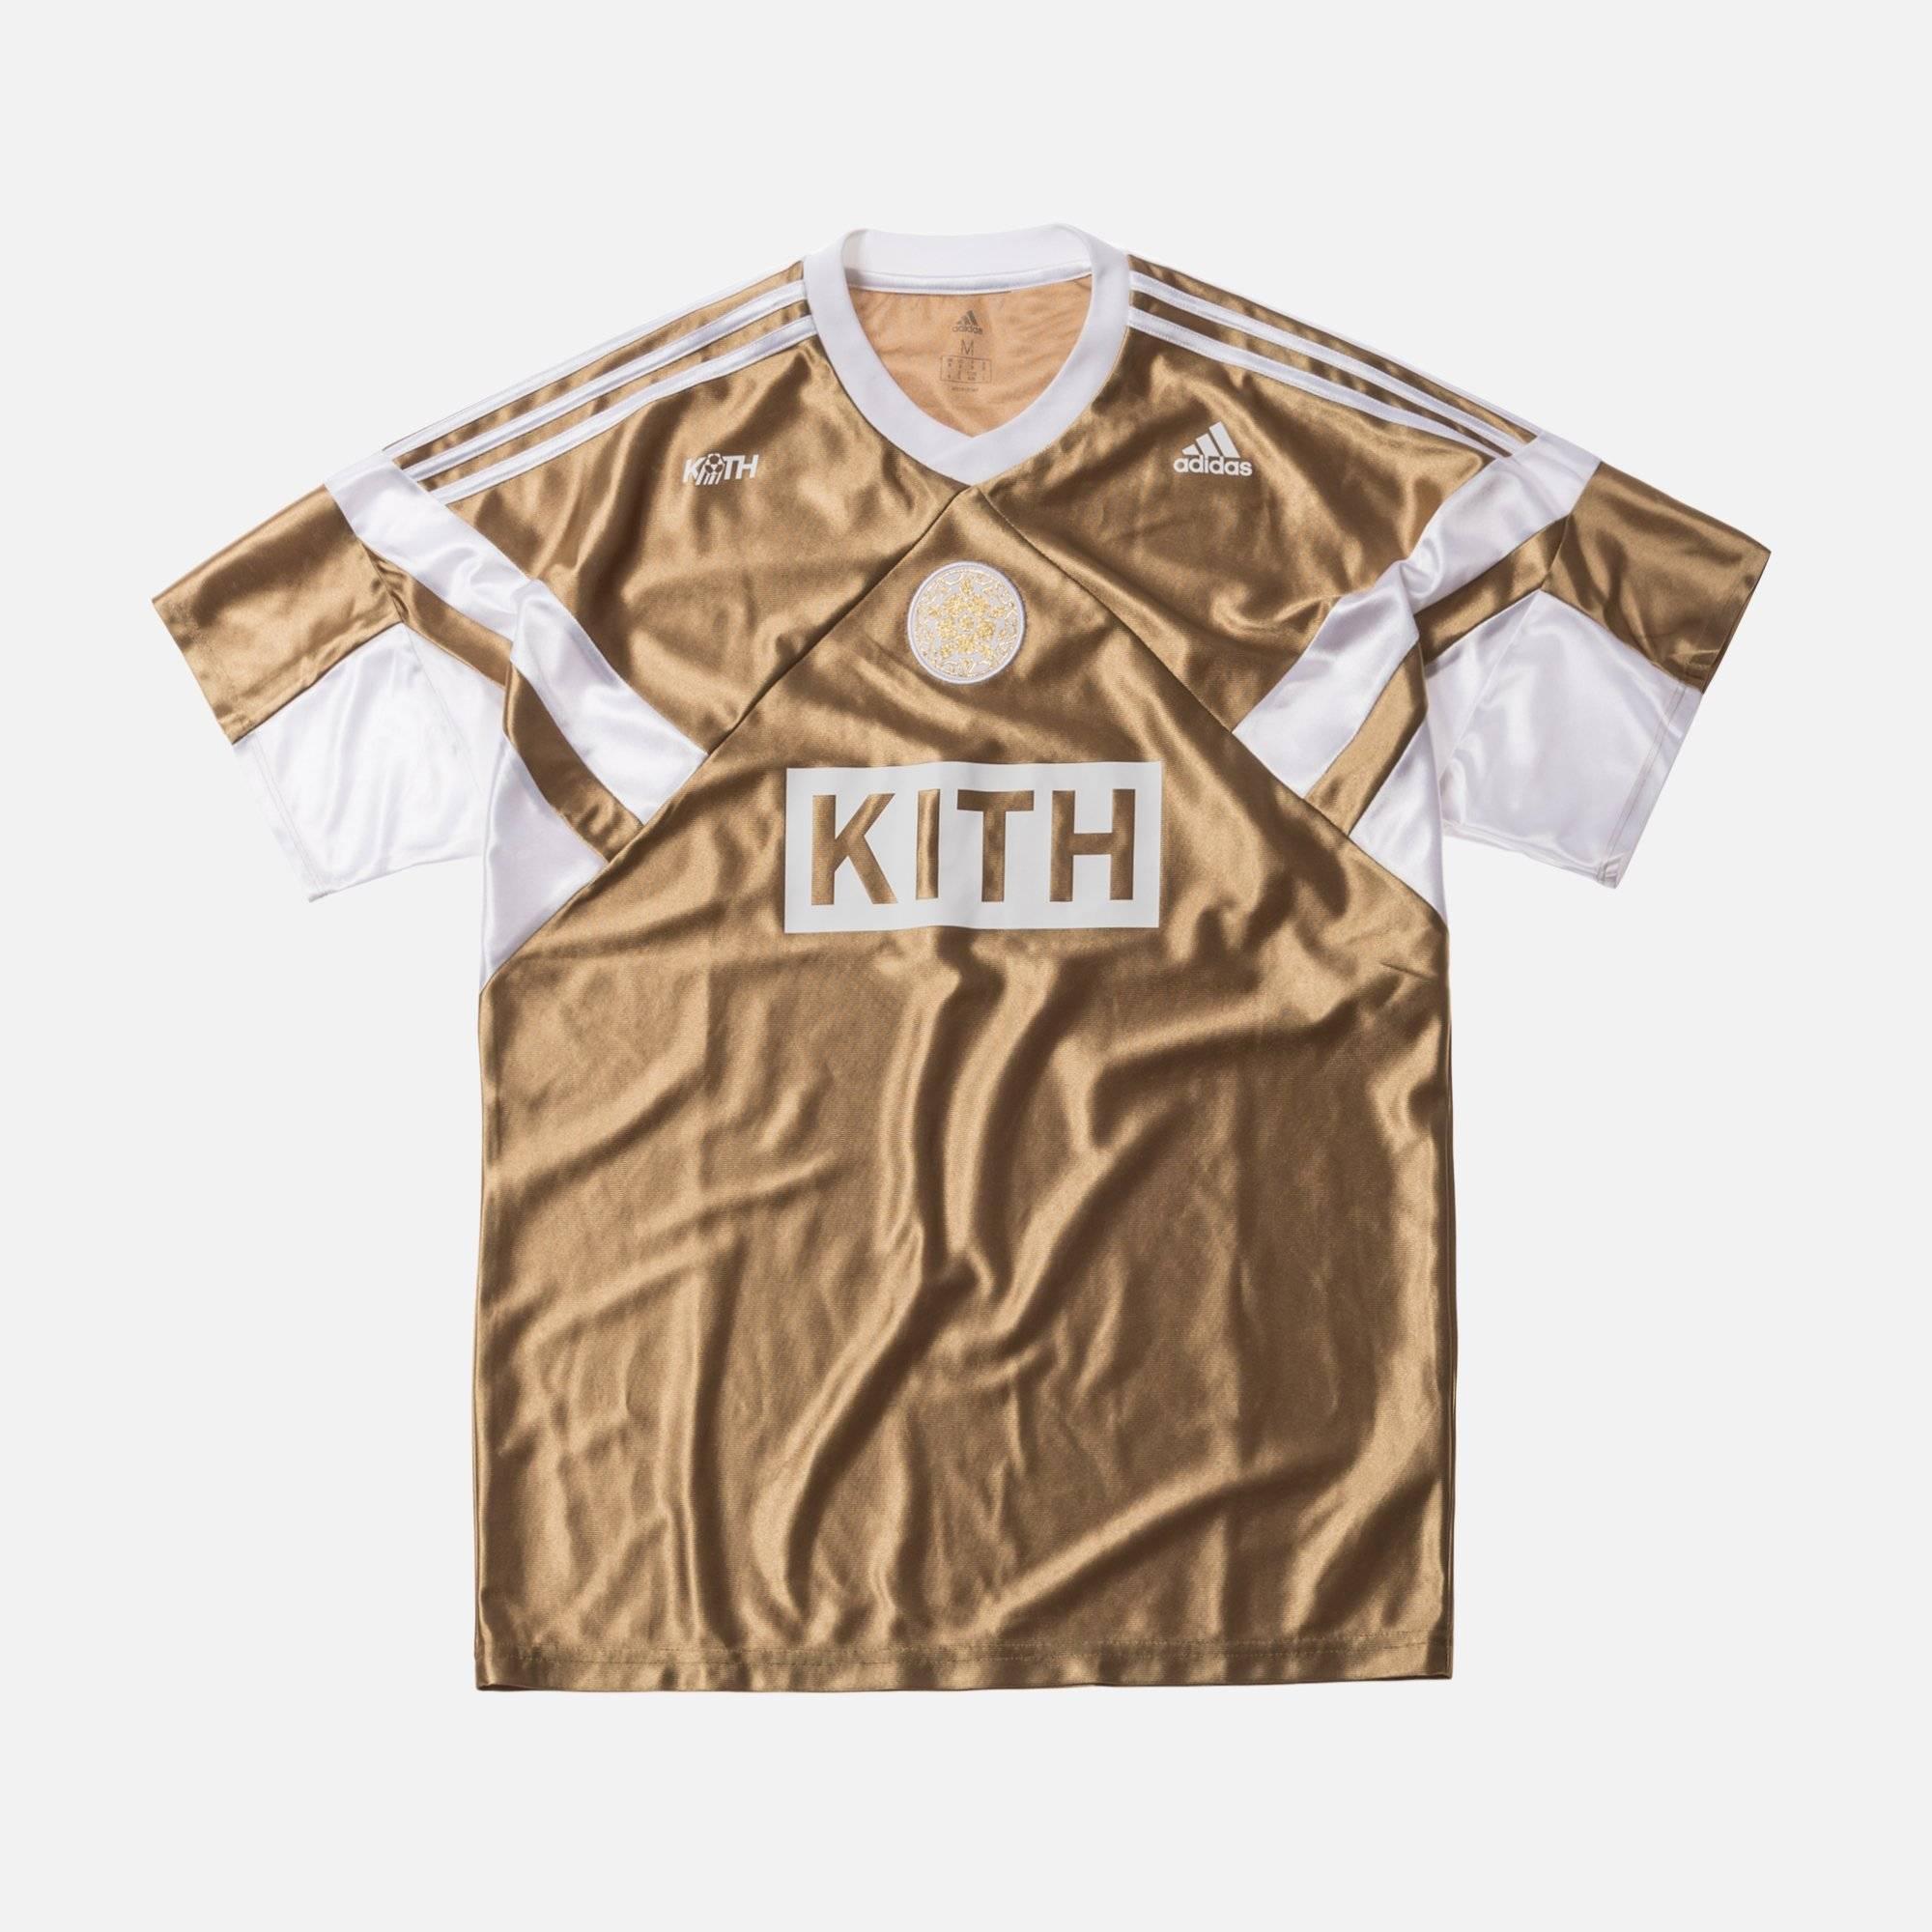 Adidas Gold Soccer Jersey